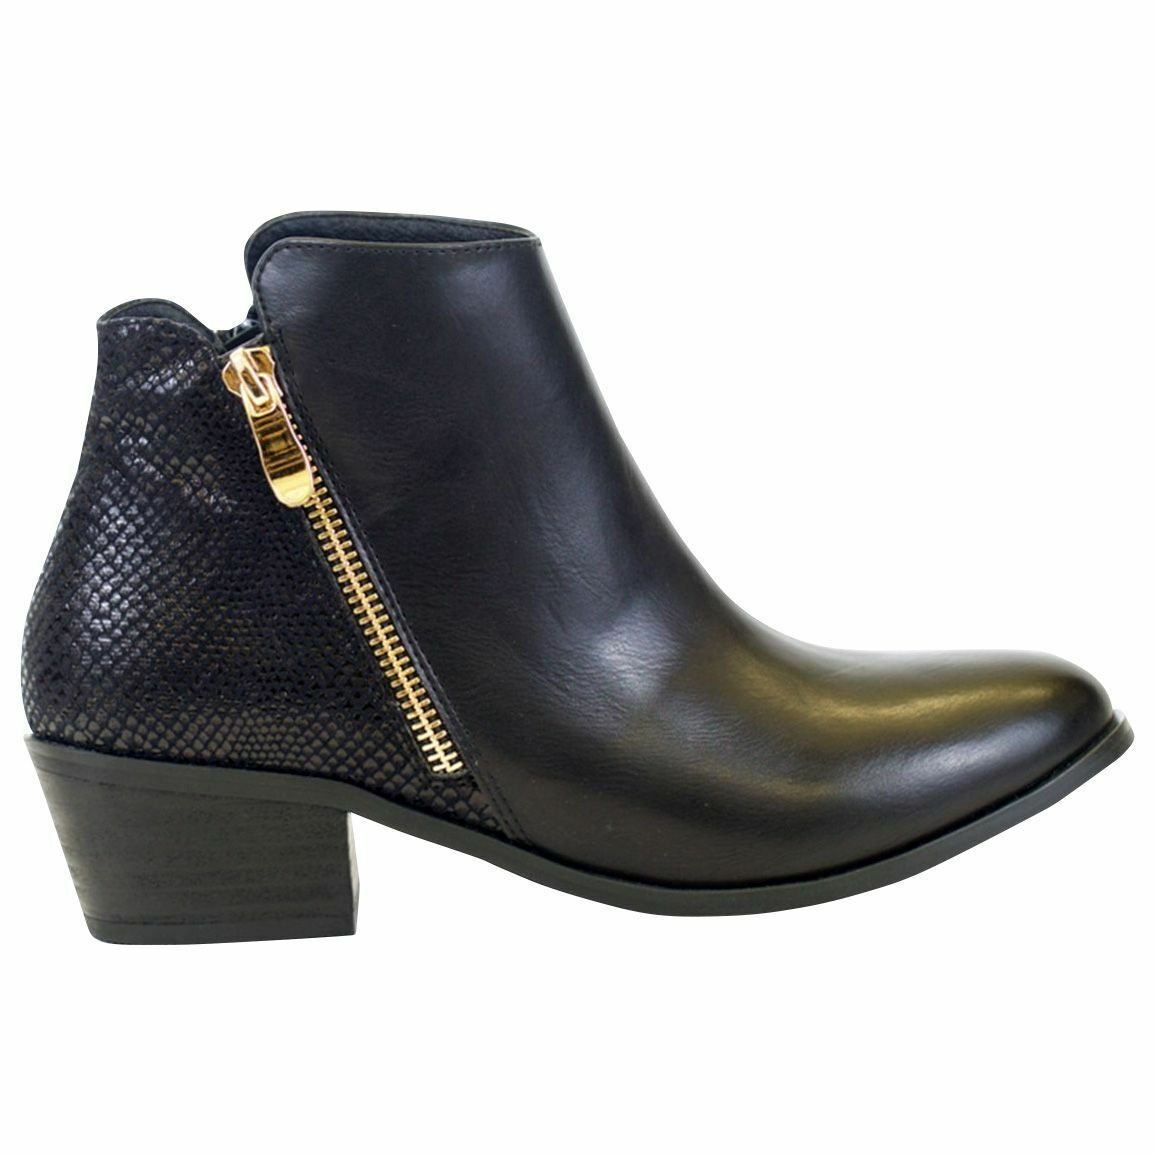 Women's GC Shoes Keller Bootie Black Size 6 #NJCHA-444